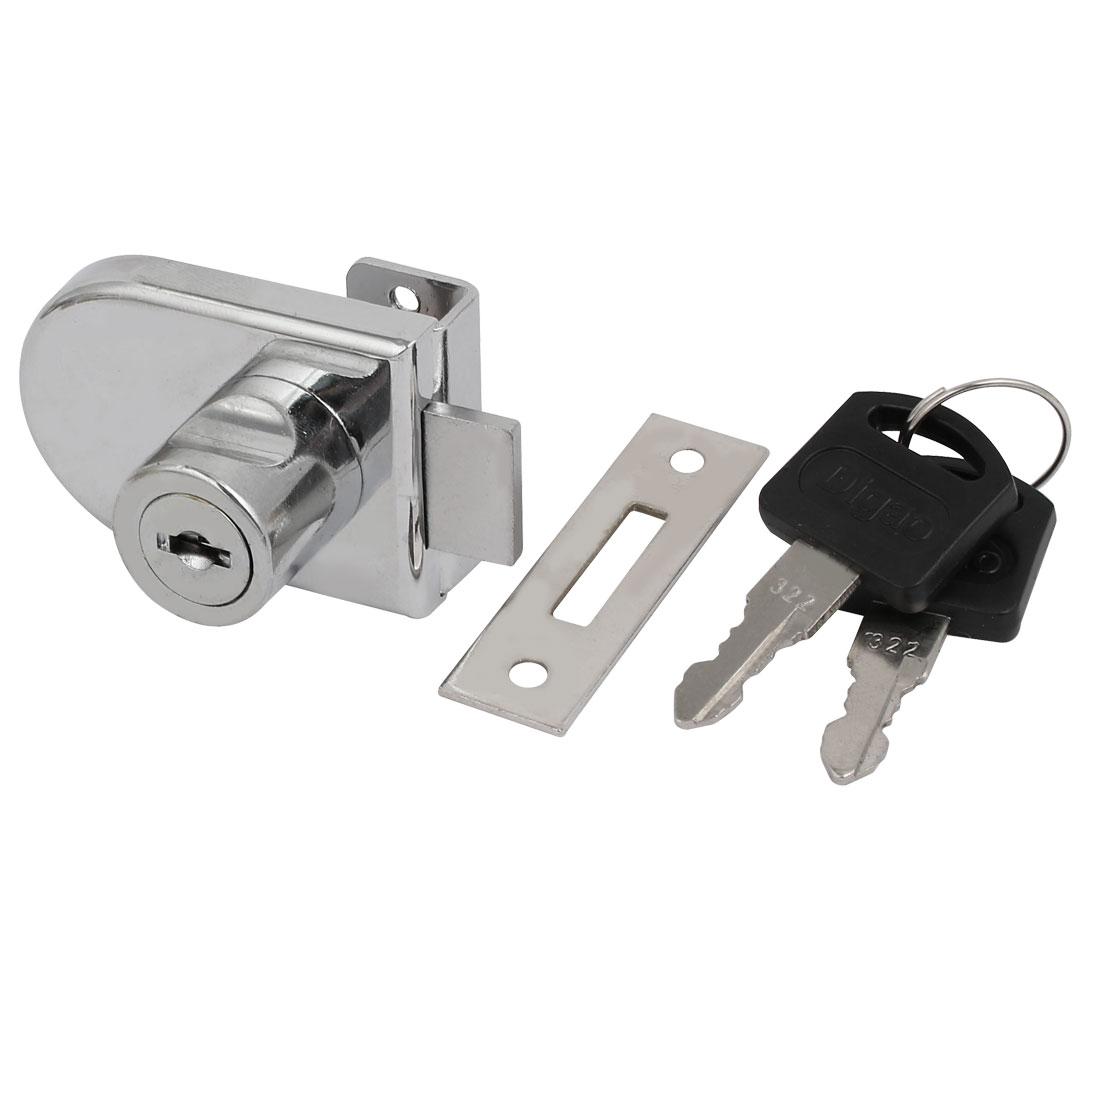 Unique Bargains Glass Door Showcase Metal Screw Mounted Security Lock 9mm Thickness w 2 Keys - image 4 de 4